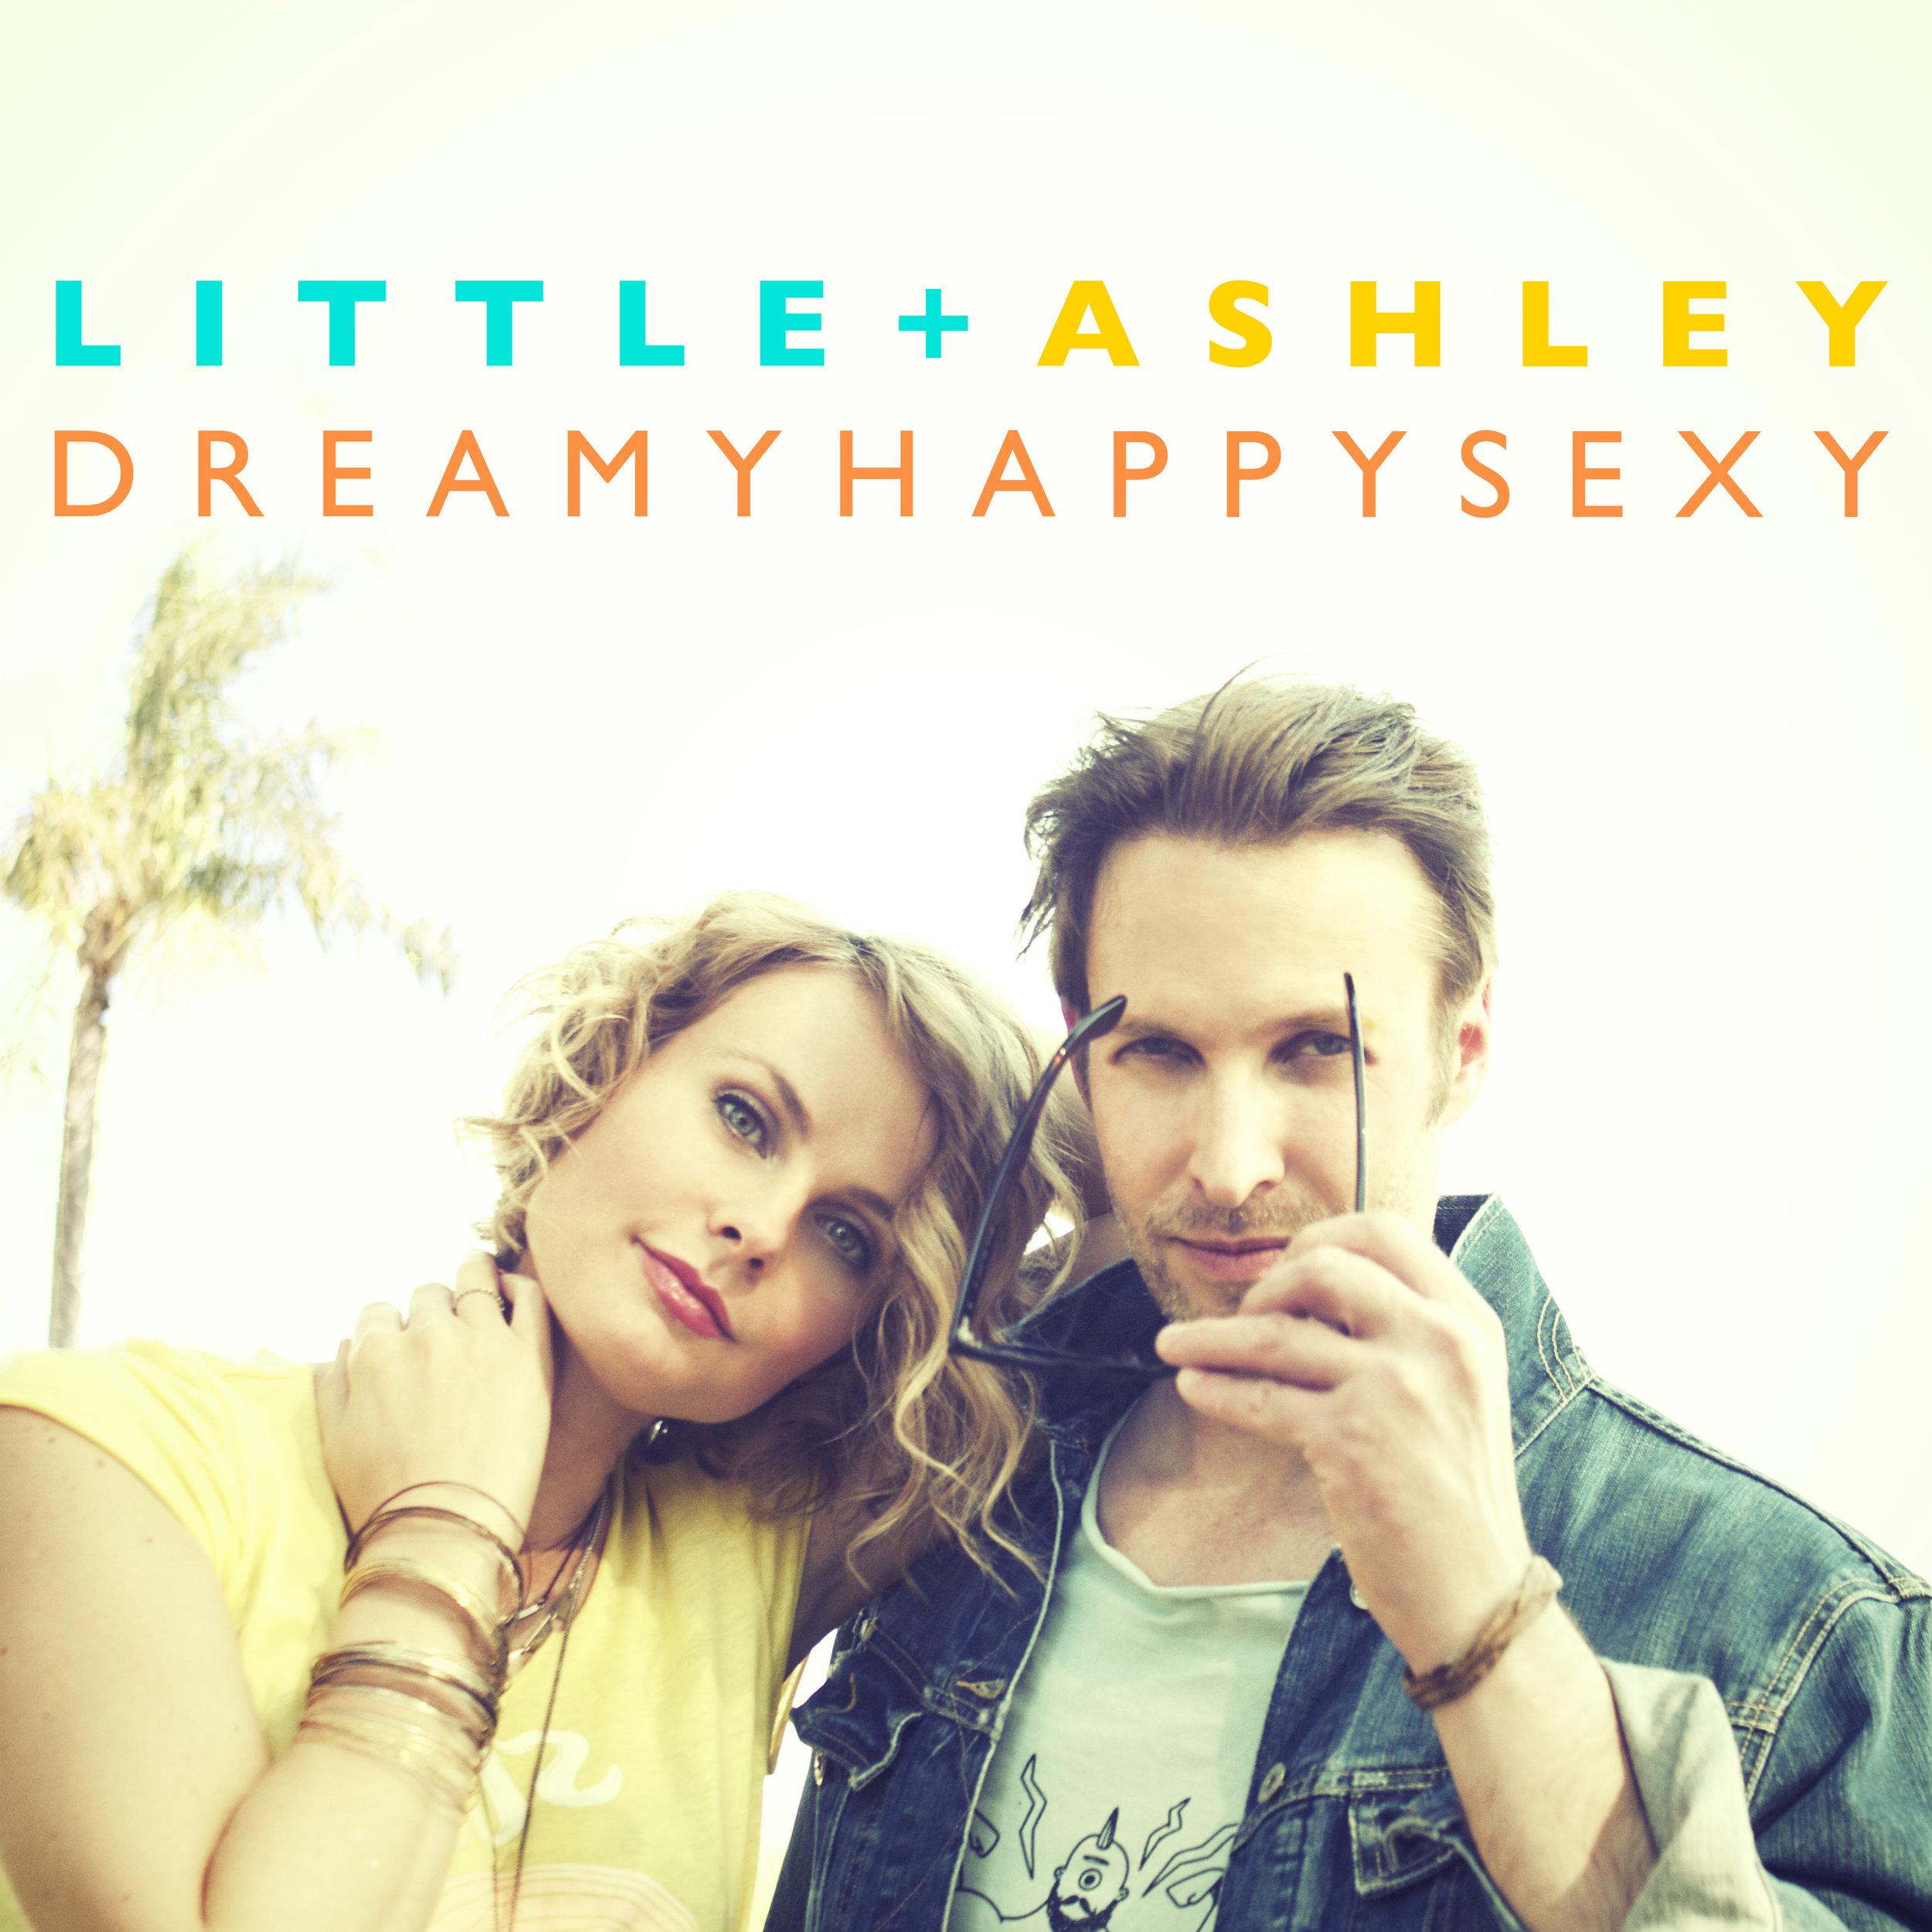 Little and Ashley_Dreamy Happy Sexy_Digital cover art.jpg